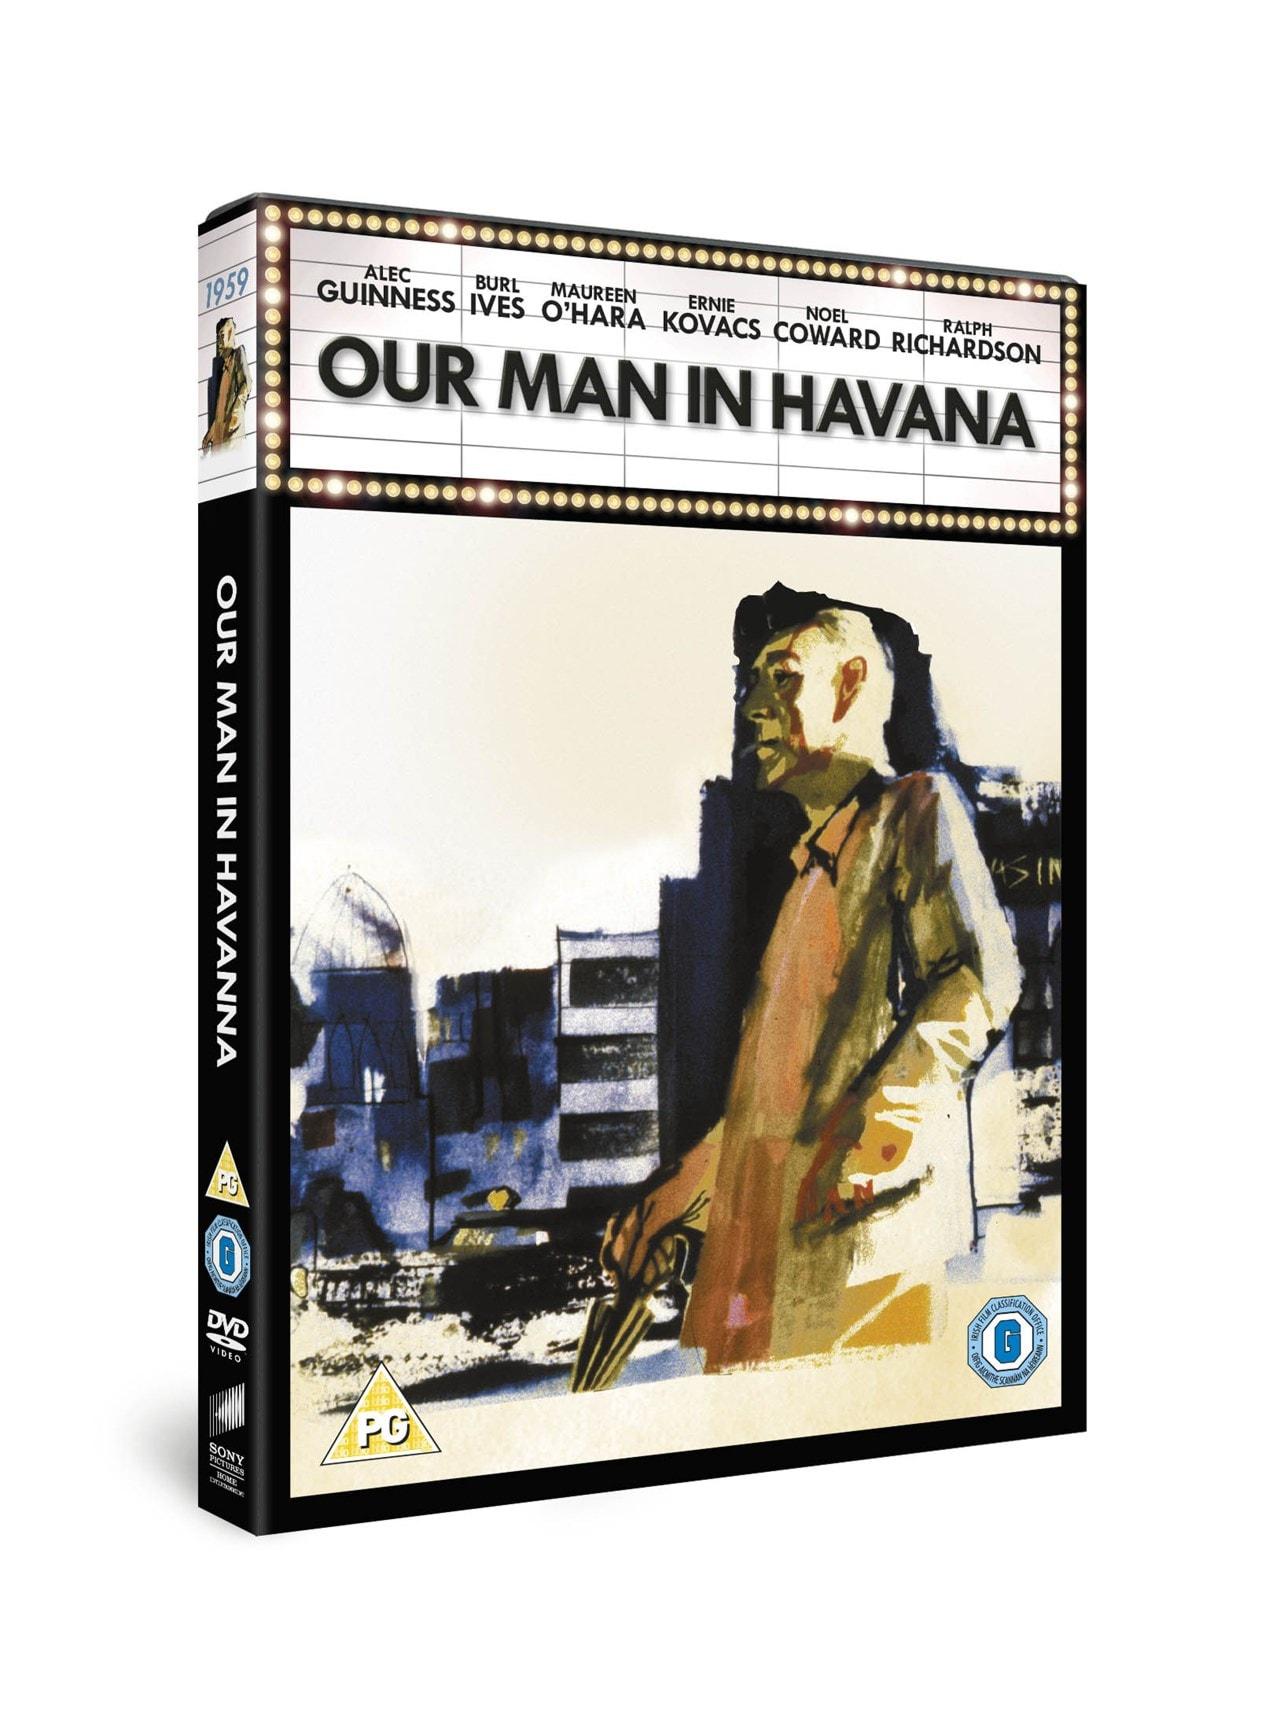 Our Man in Havana - 3